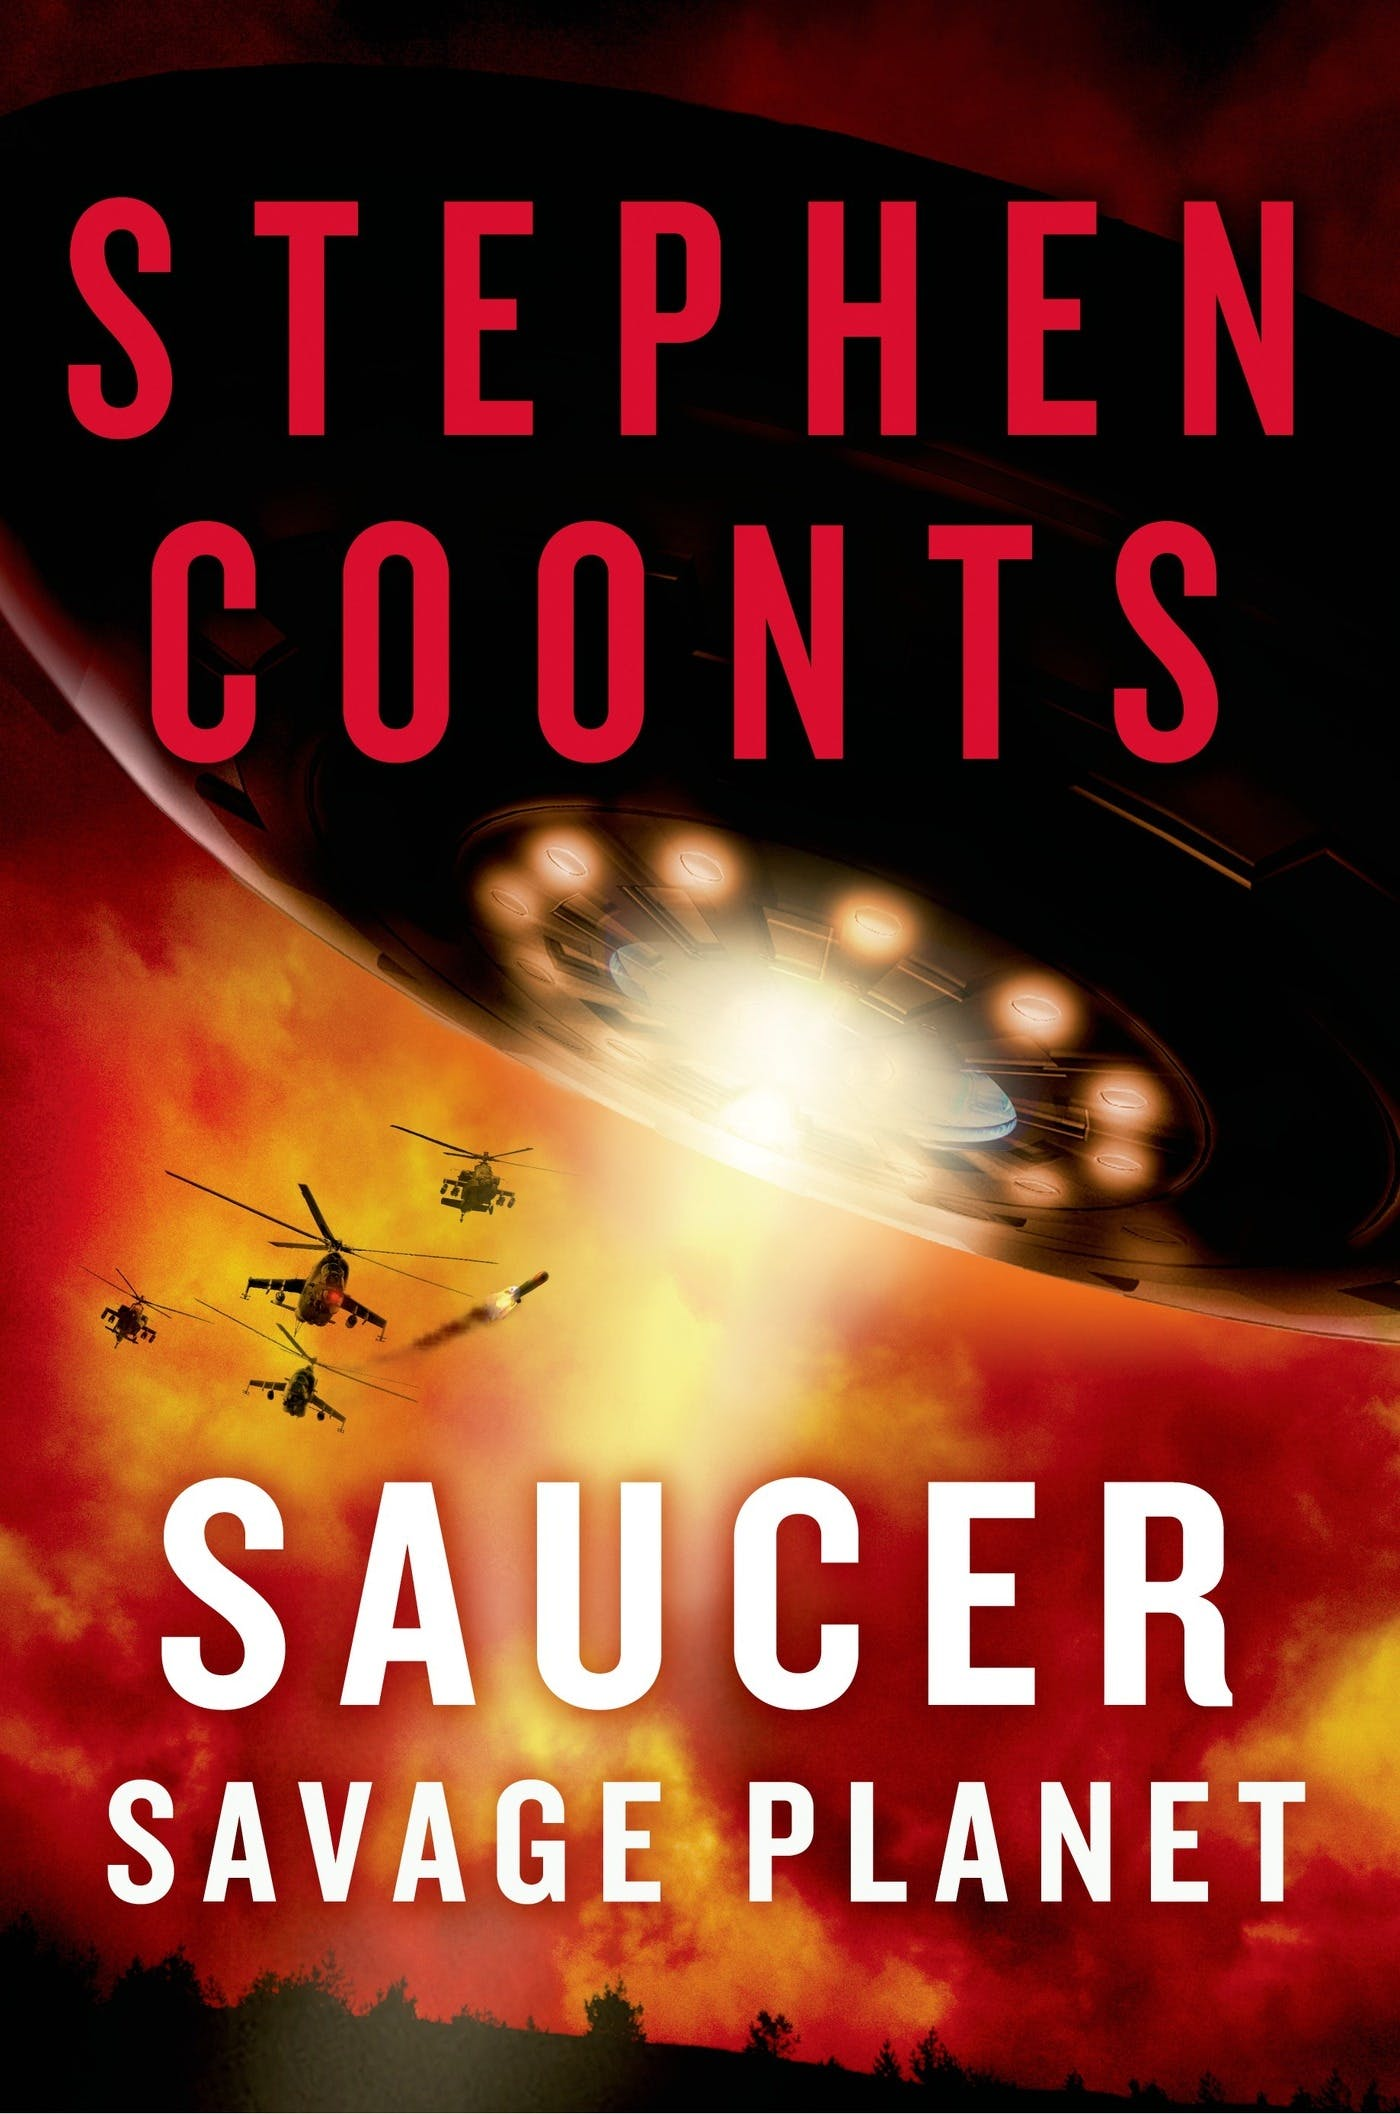 Image of Saucer: Savage Planet